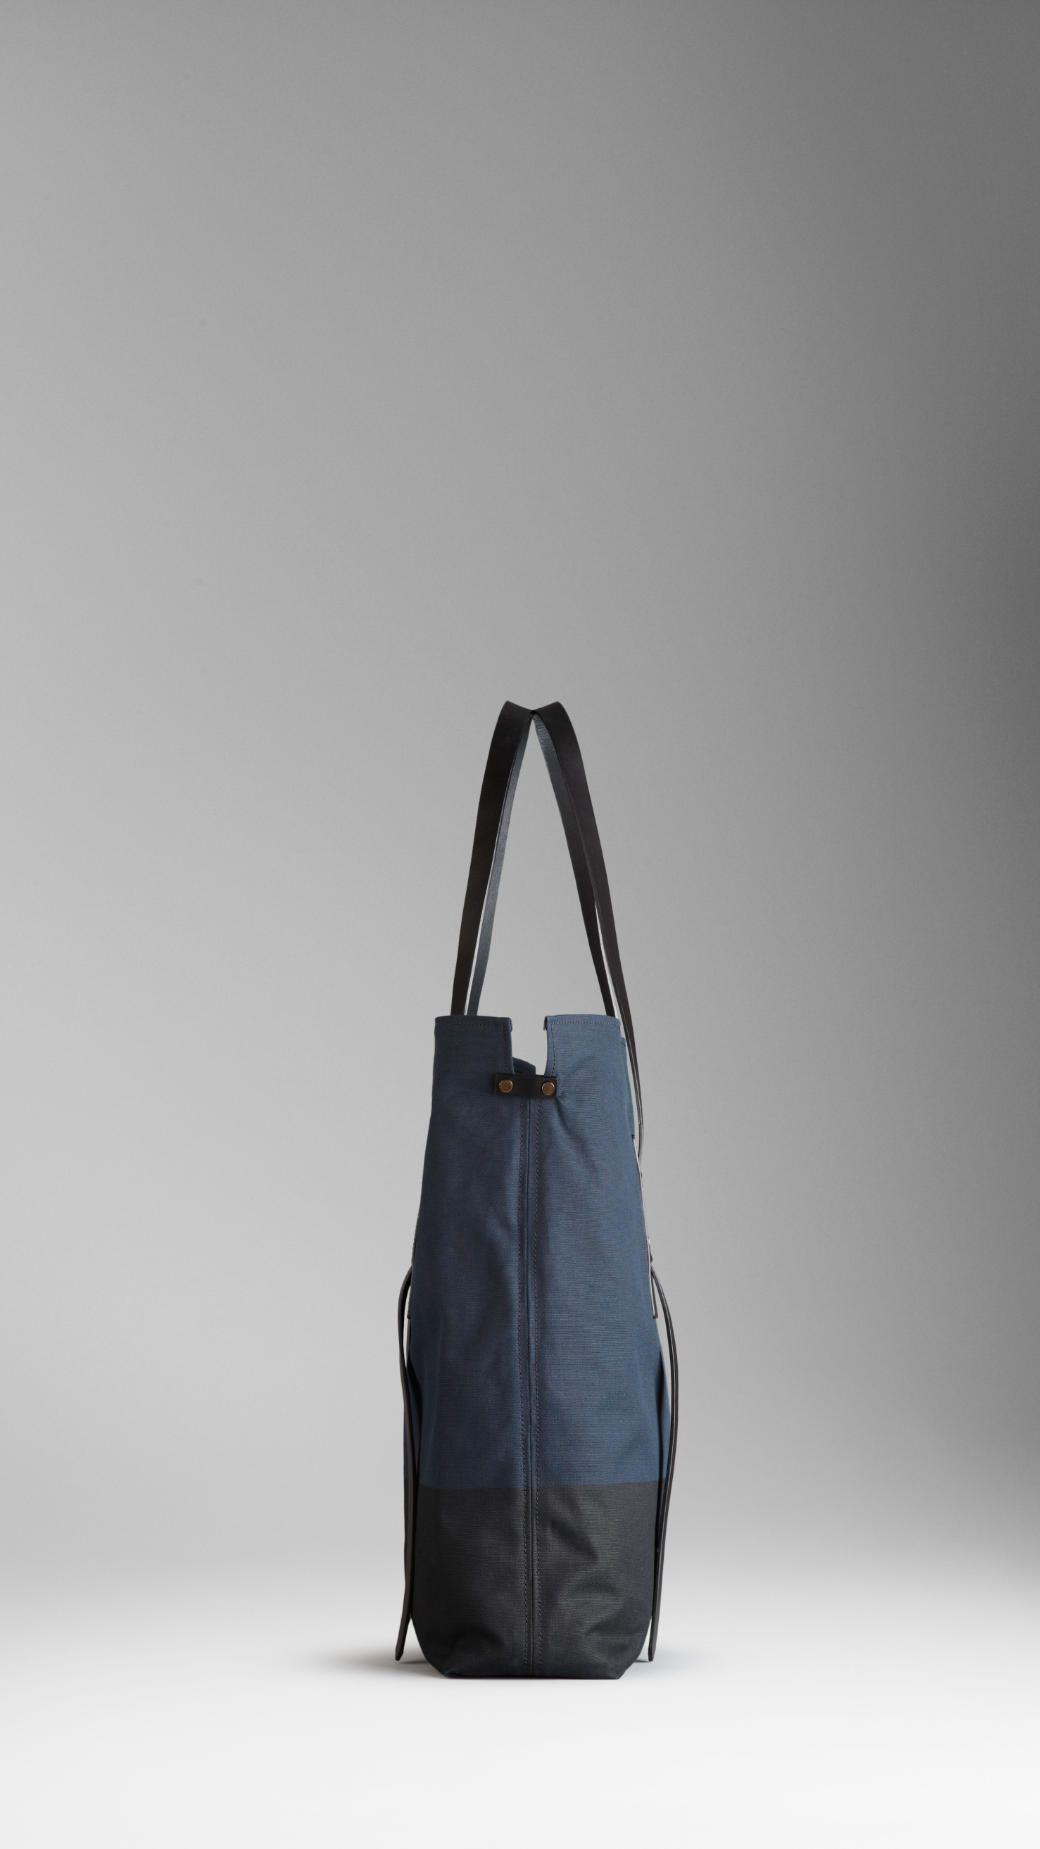 d98a072fb48b Burberry mens canvas tote bag 3   bags   Canvas tote bags, Bags ...